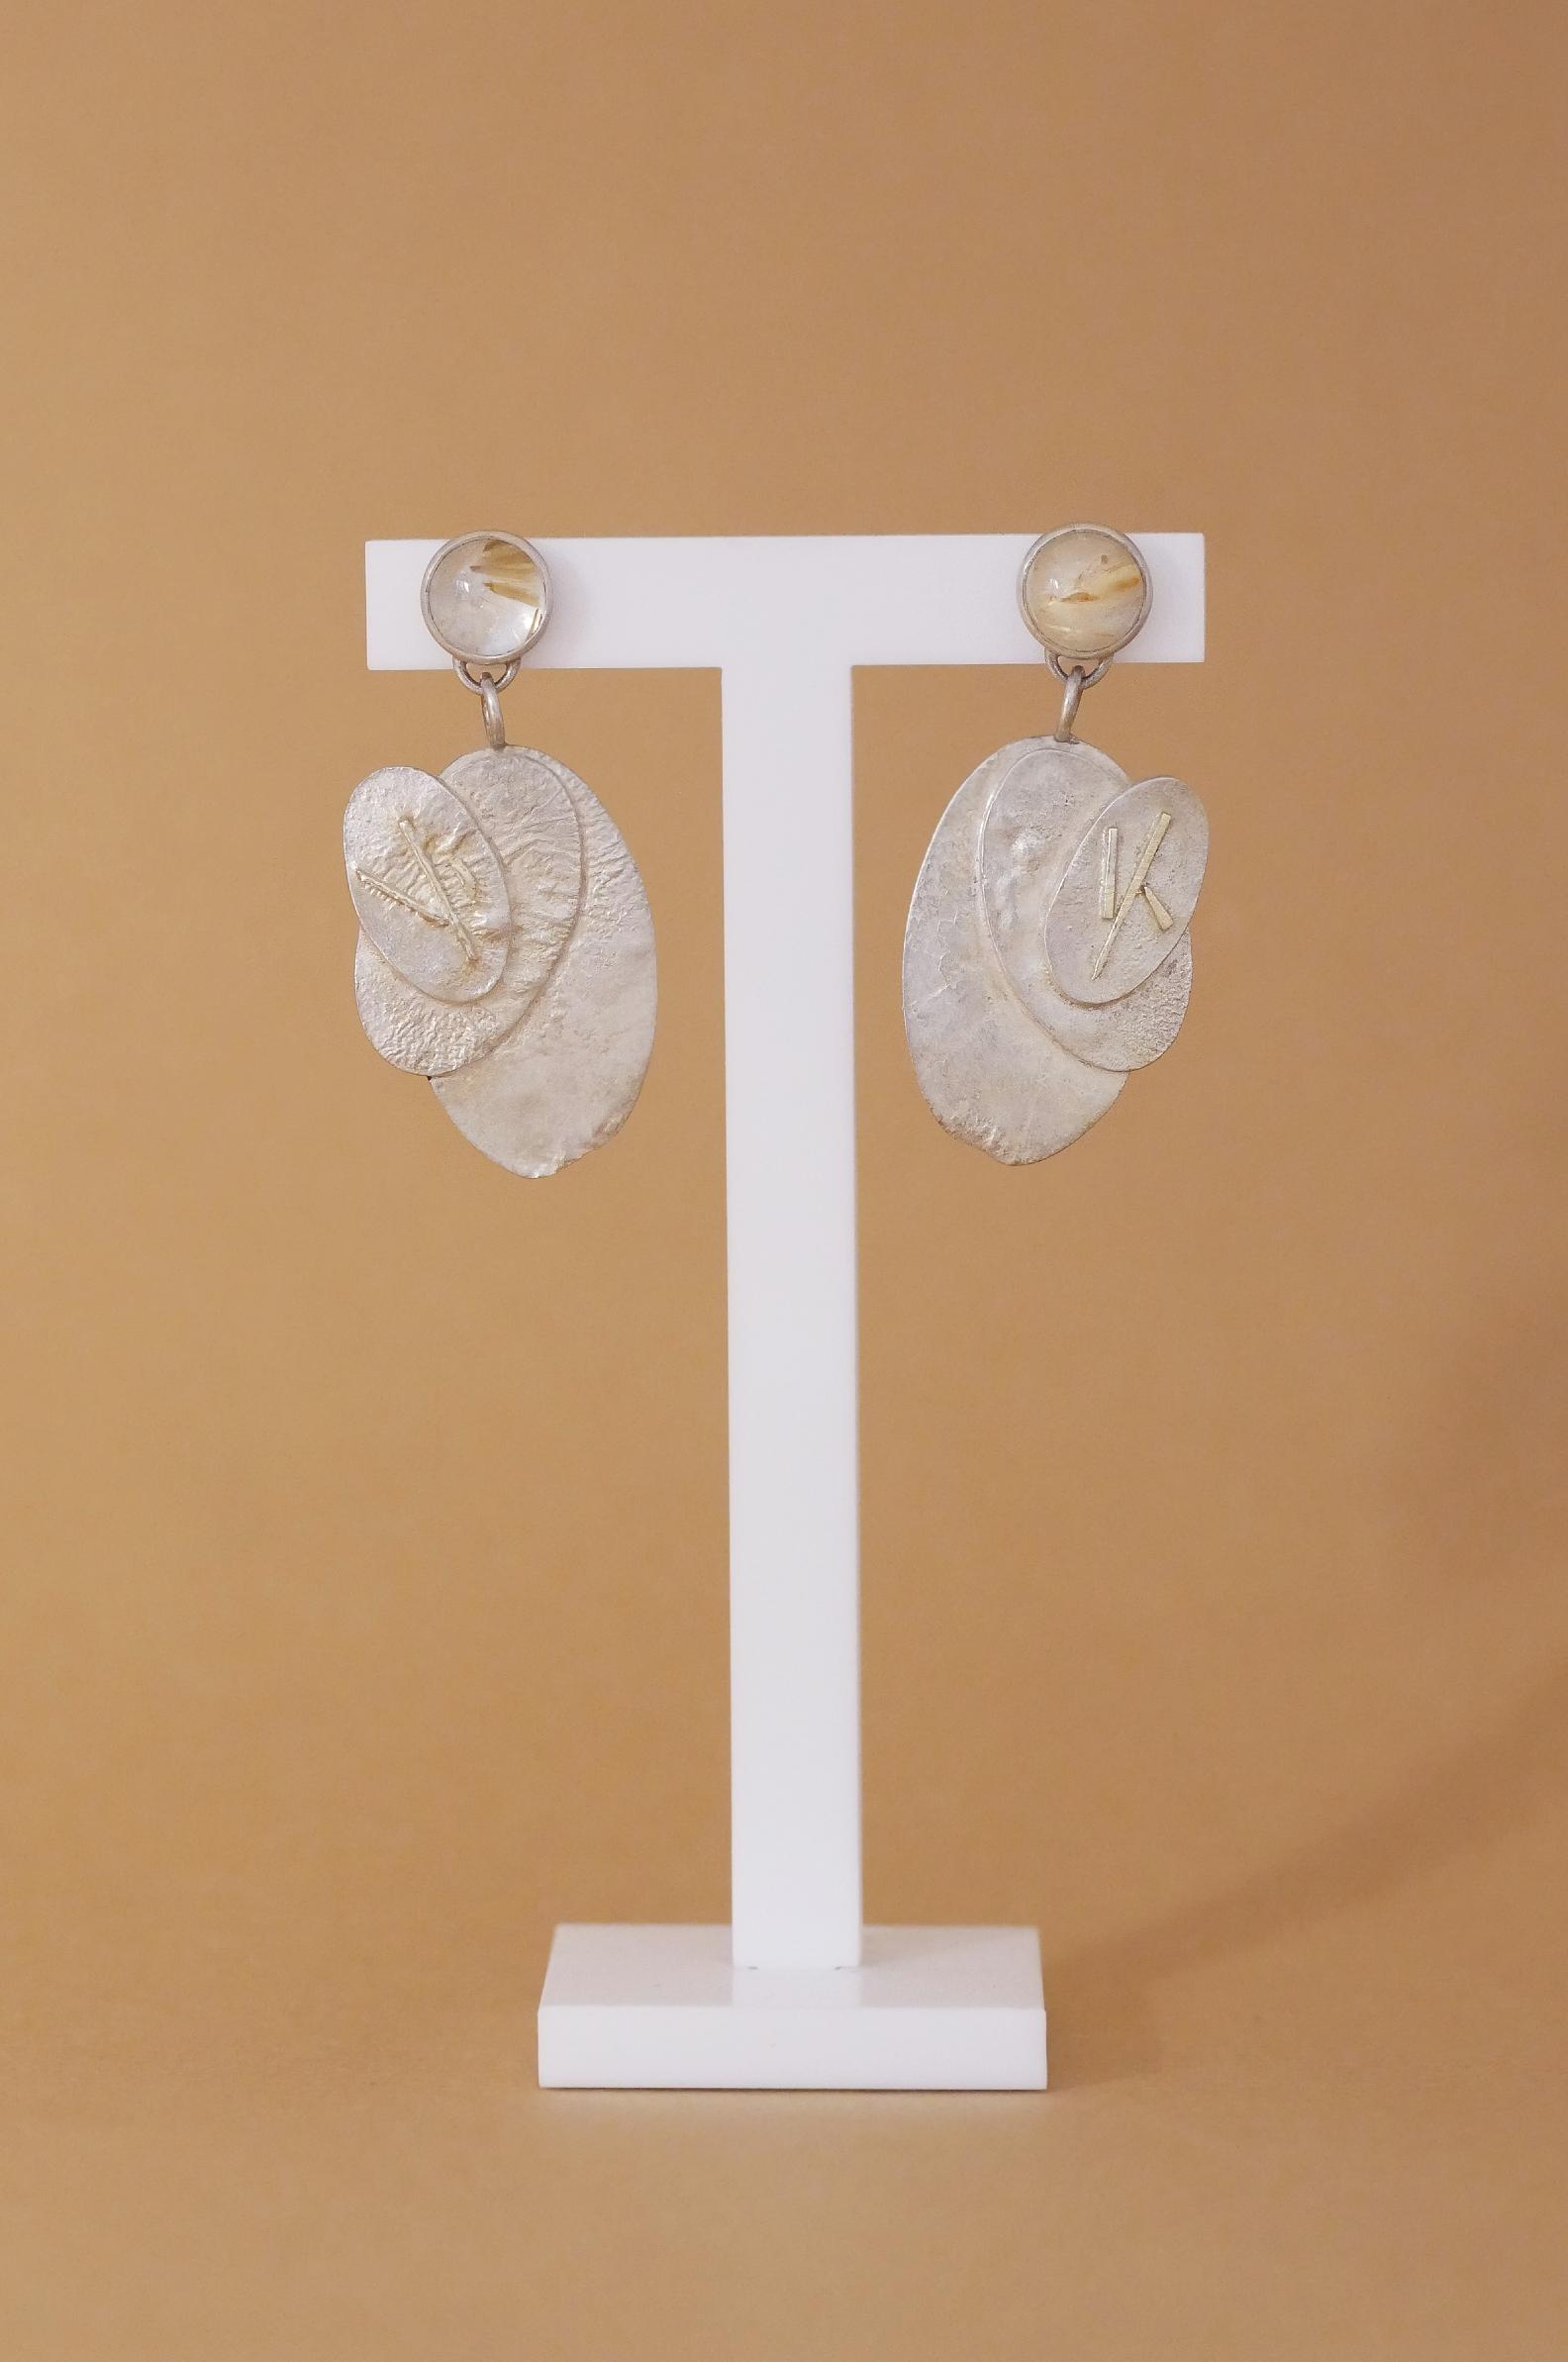 TUKOA-Ohrringe Silber mit Rutilquarz